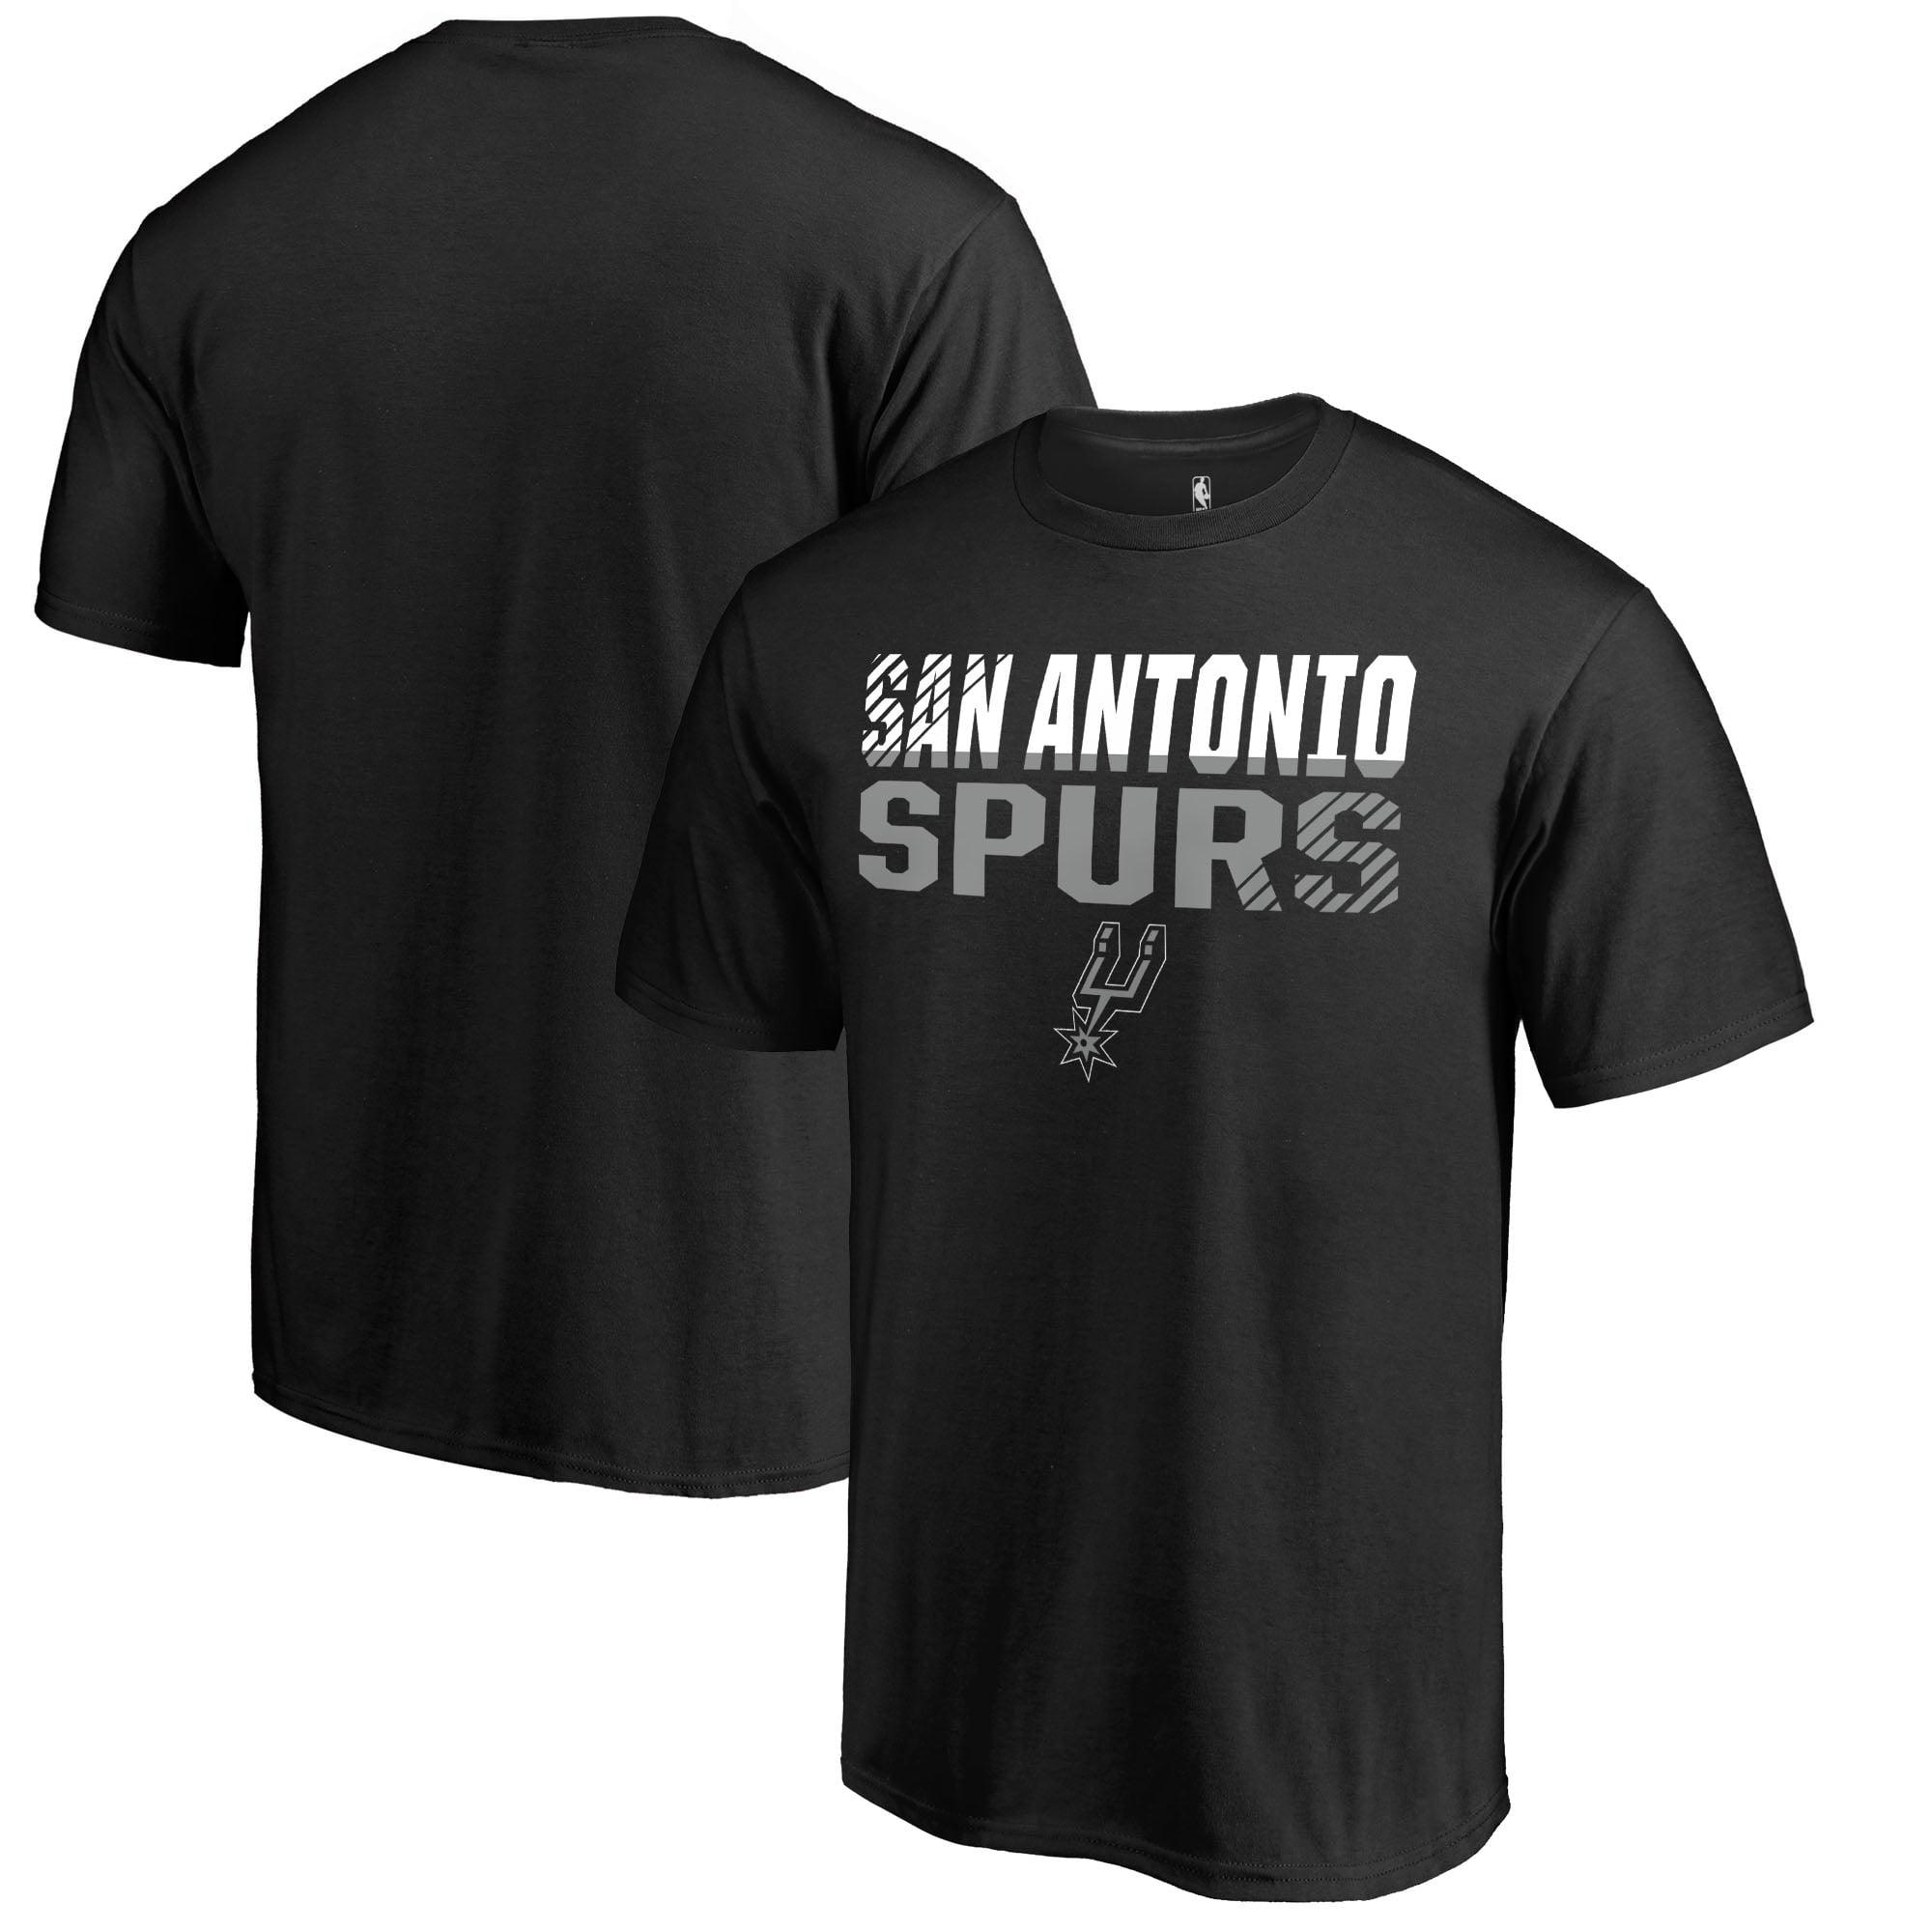 San Antonio Spurs Fanatics Branded Fade Out T-Shirt - Black